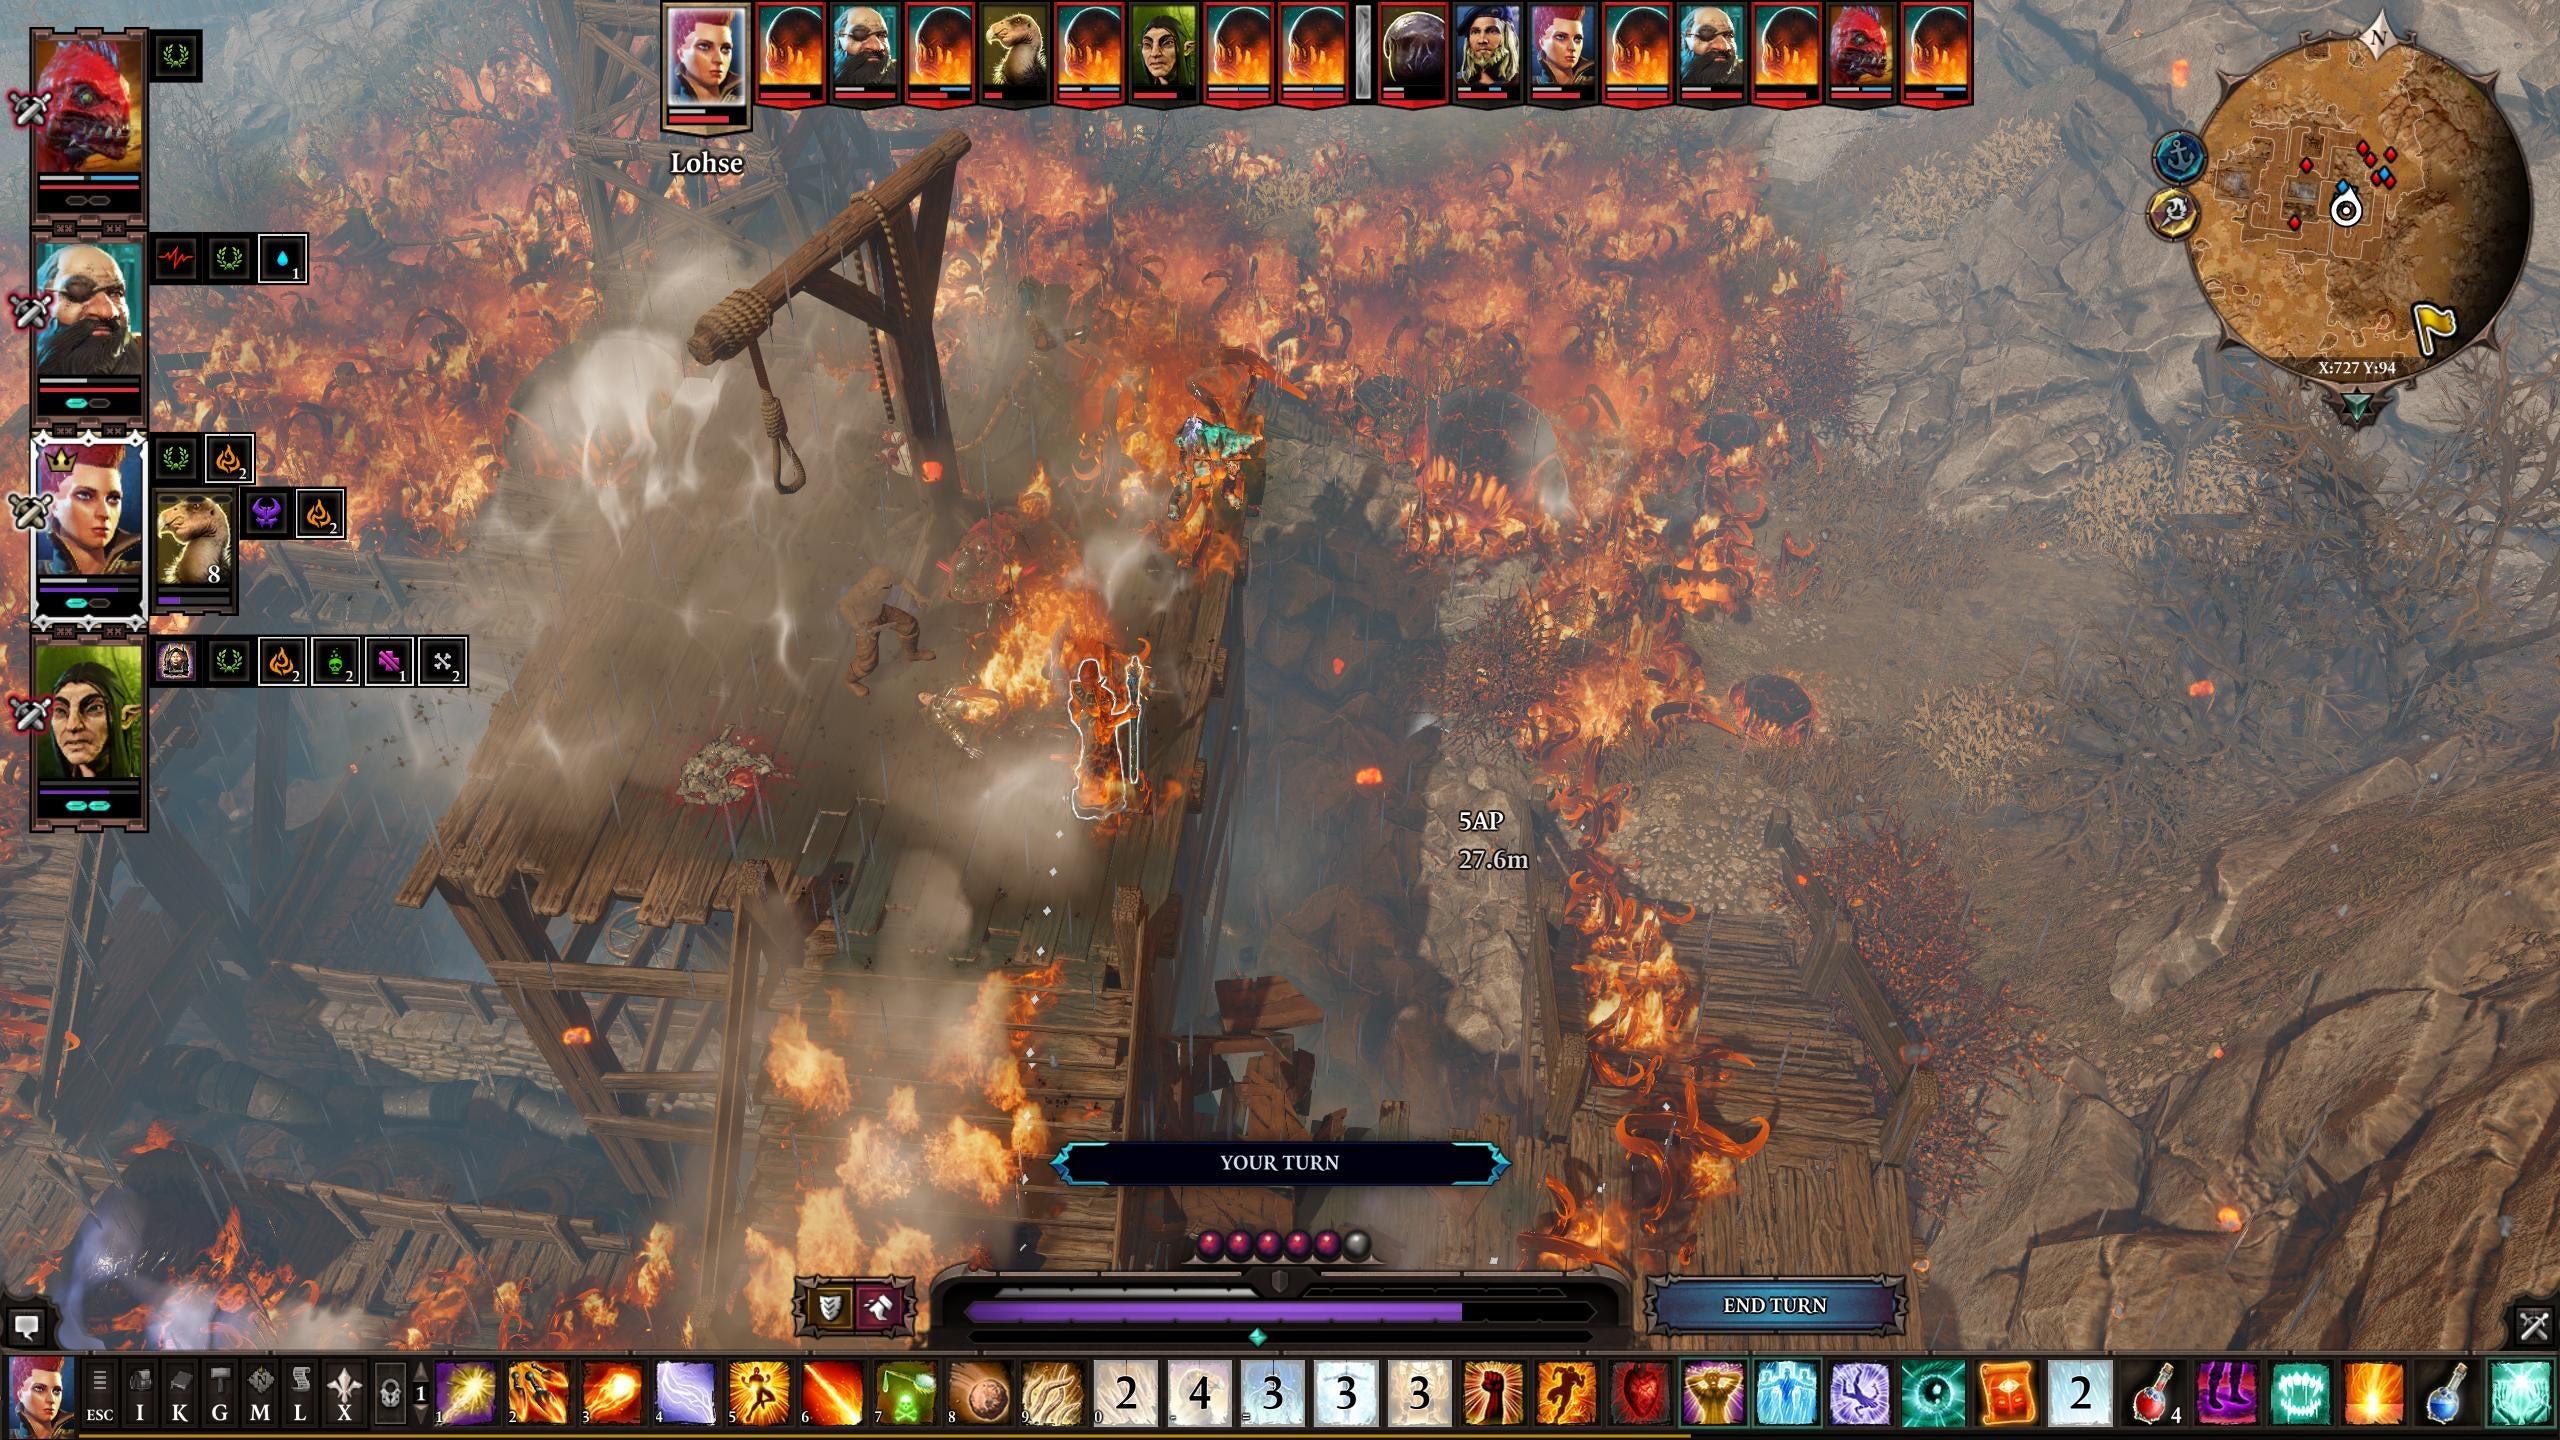 Divinity: Original Sin 2 Battles Sure Do Escalate Quickly